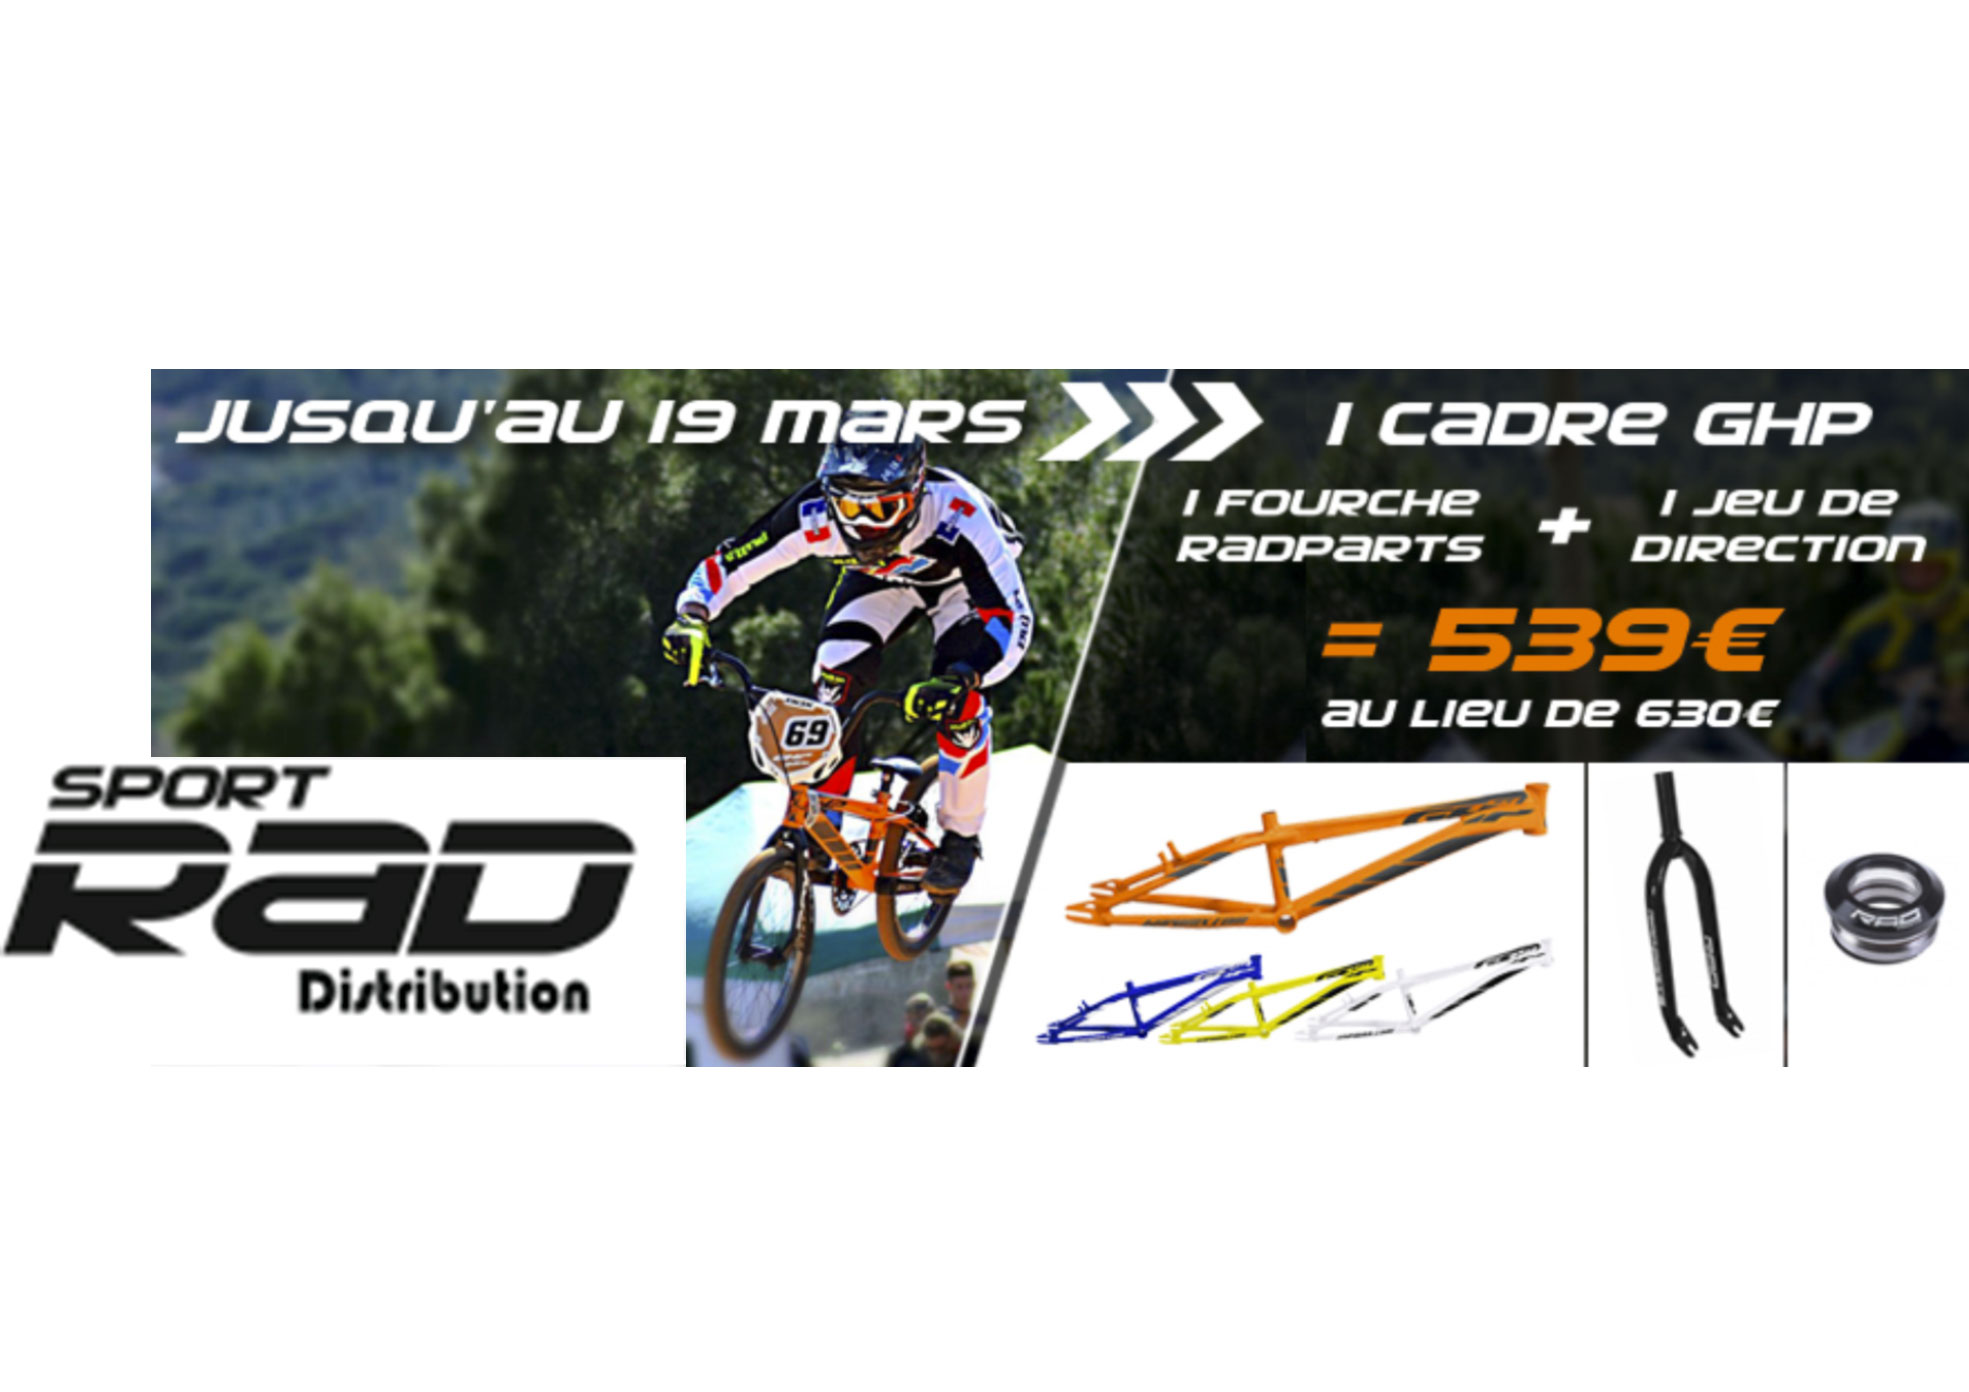 Promo kit cadre GHP + Fourche et Jdd RAD